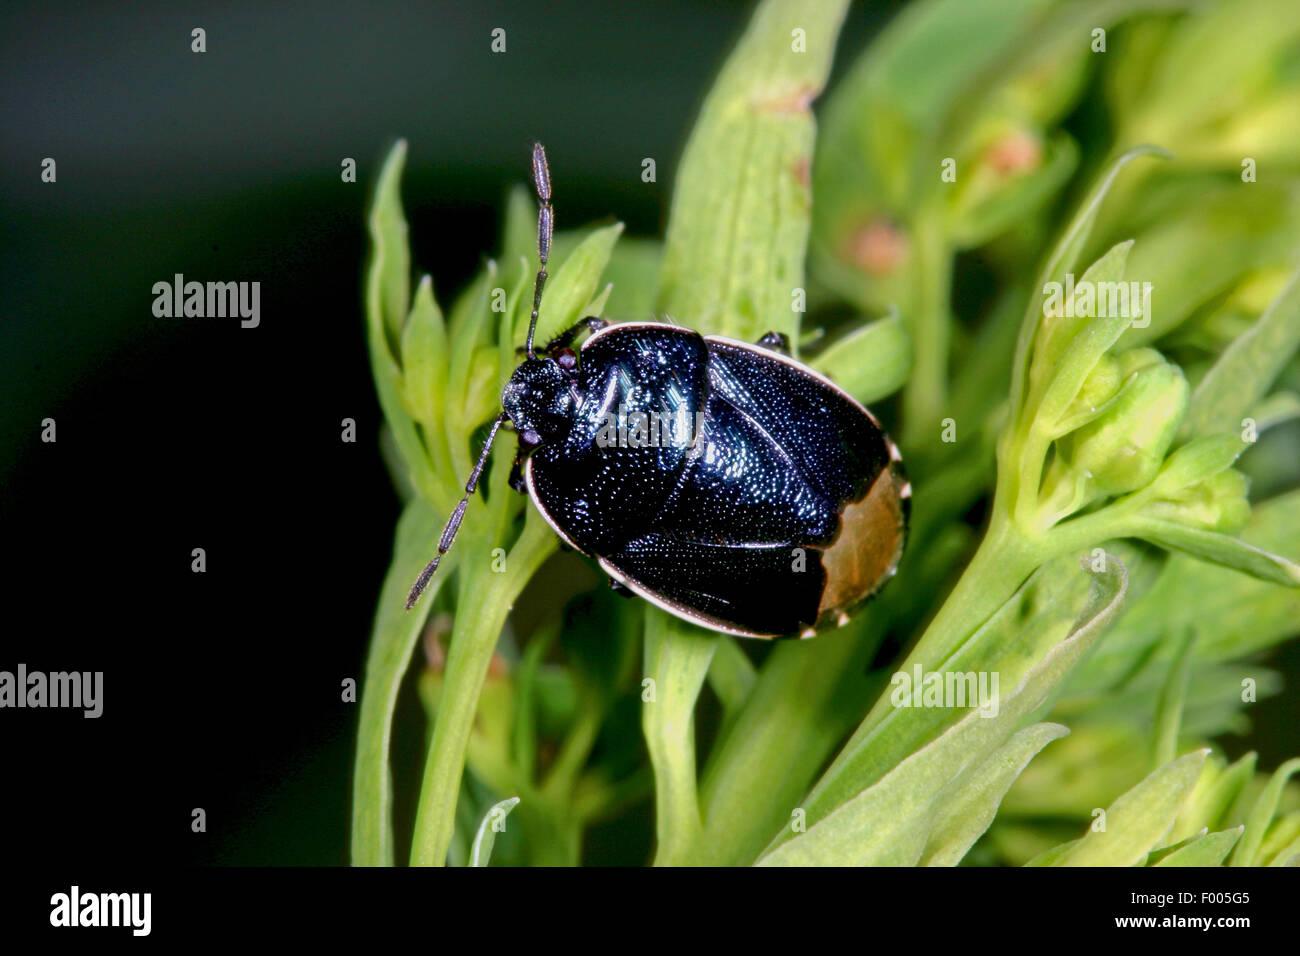 Burrower bug, Cydnid bug, Burrowing bug, Negro bug (Canthophorus dubius), on a plant, Germany - Stock Image